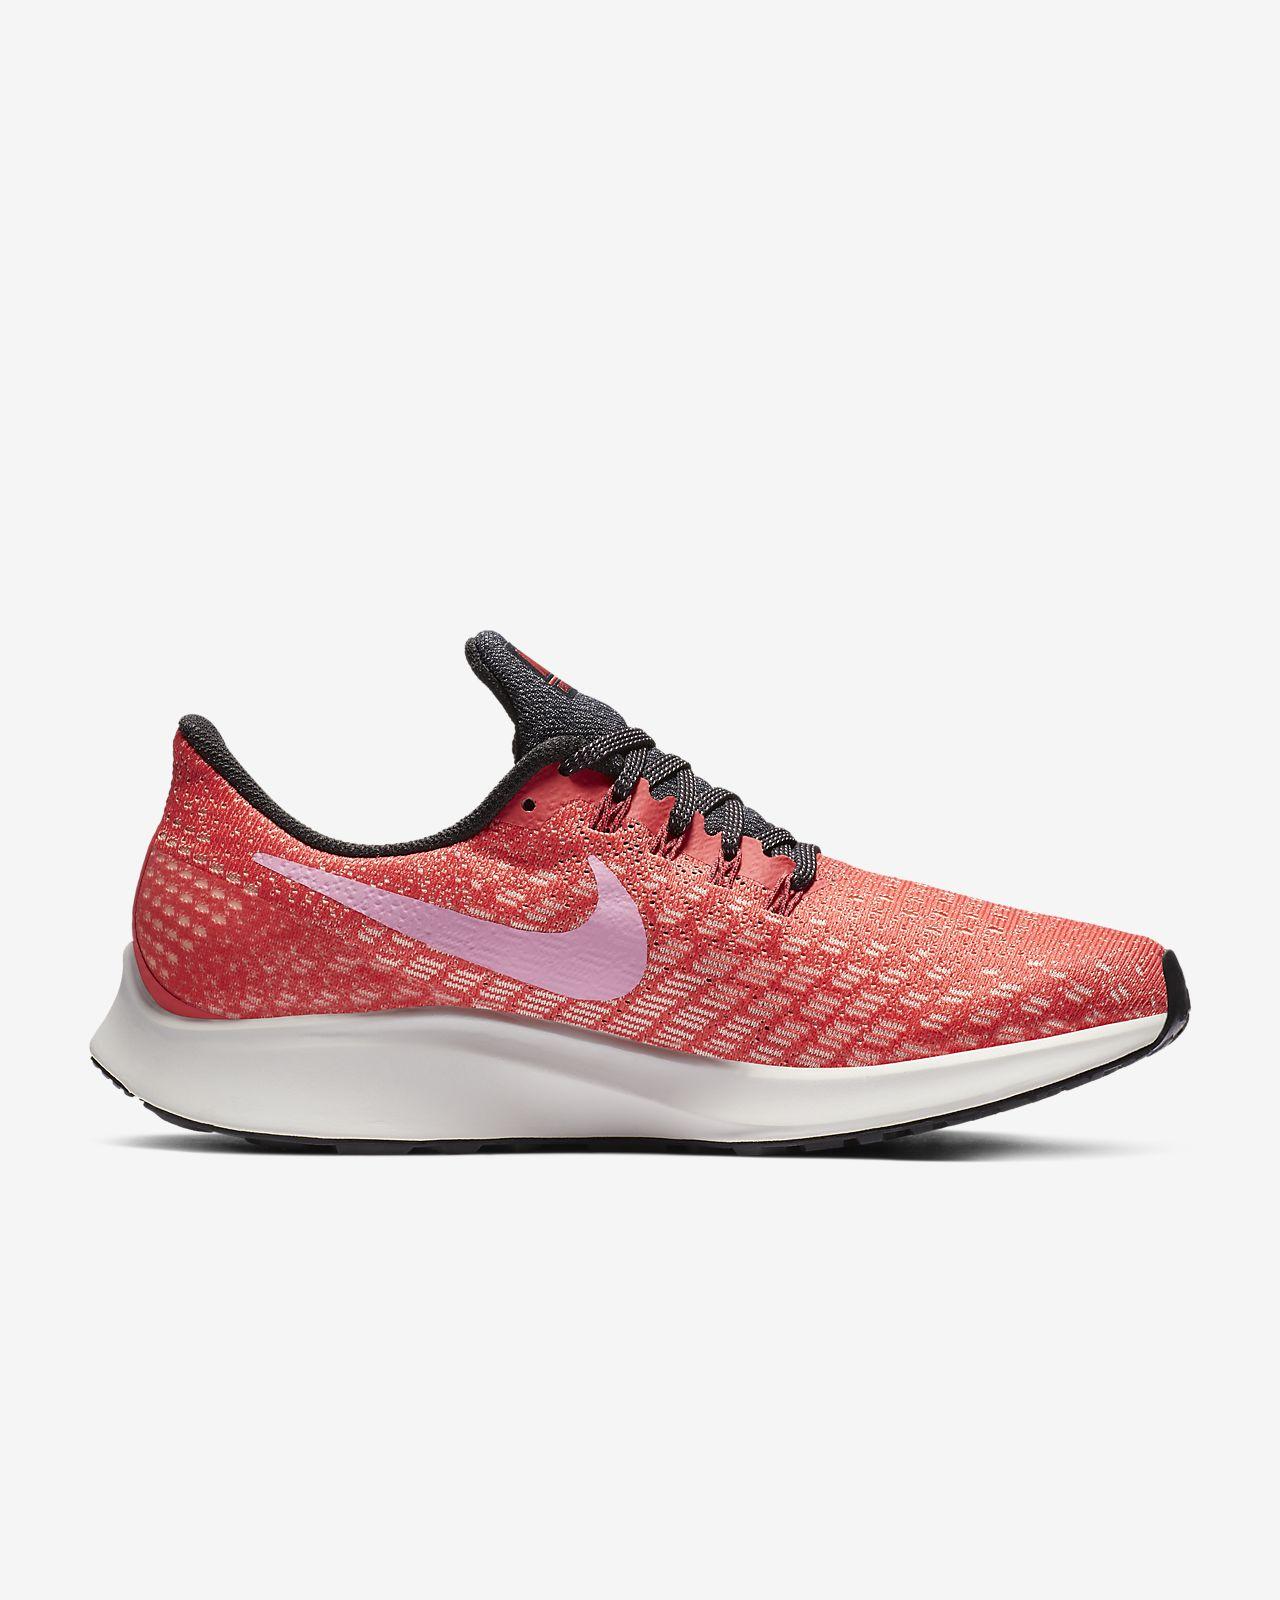 new product 4430c 7858b ... Chaussure de running Nike Air Zoom Pegasus 35 pour Femme